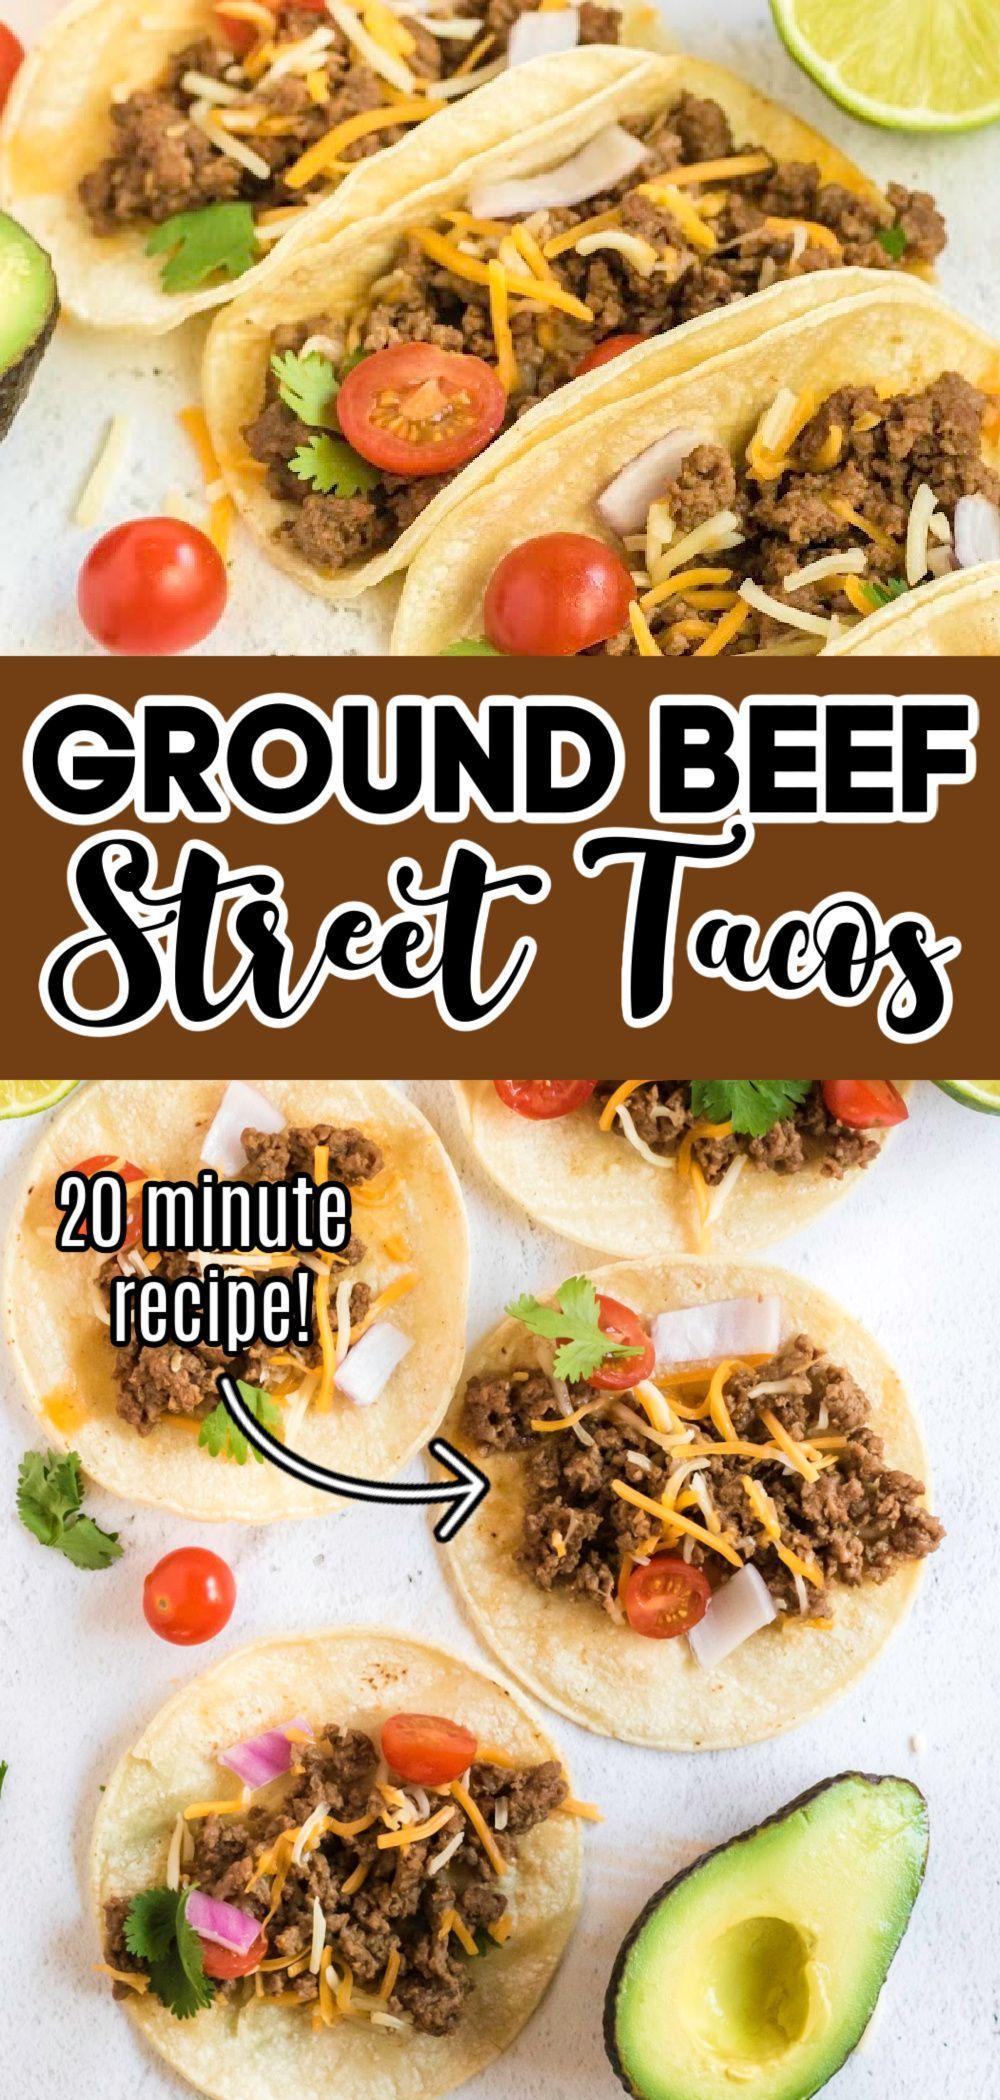 Ground Beef Street Tacos Pinkwhen Recipe In 2020 Minced Beef Recipes Taco Recipes Ground Beef Easy Meals